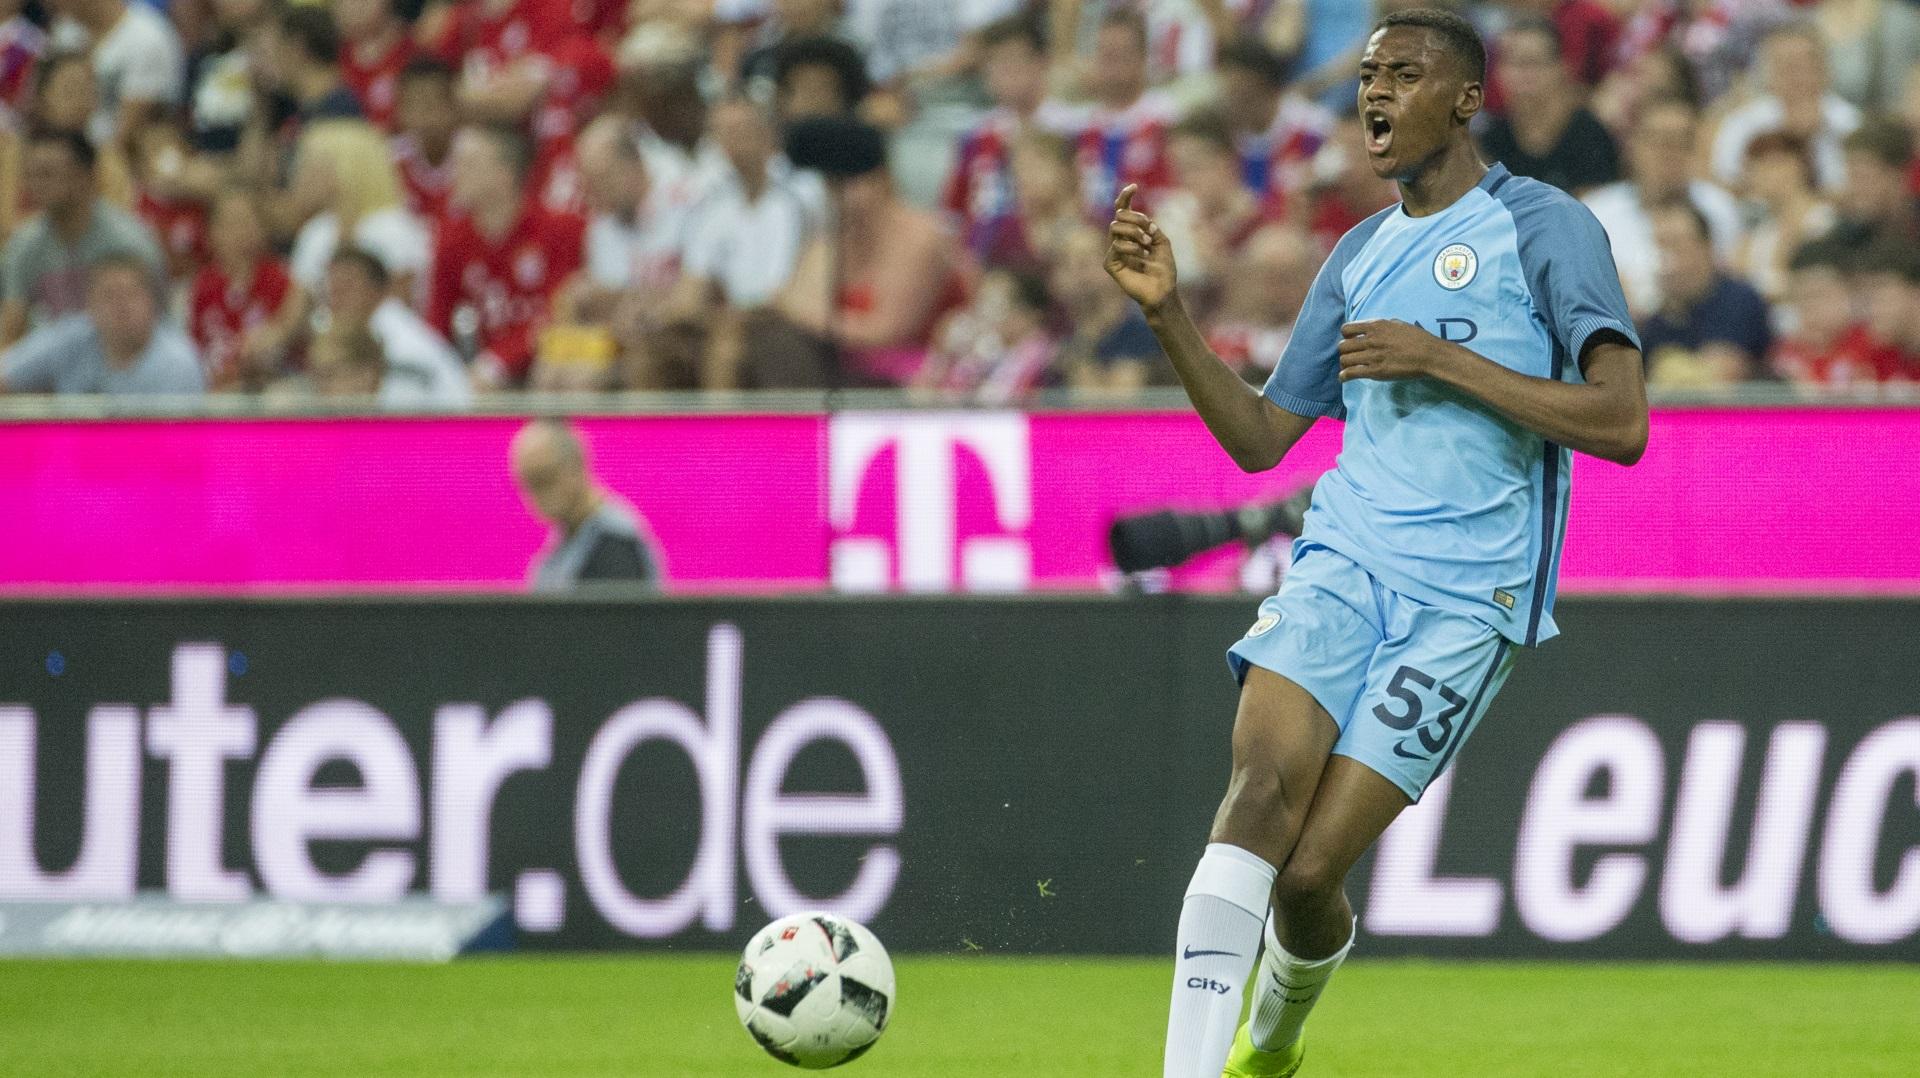 Tosin Adarabioyo of Manchester City